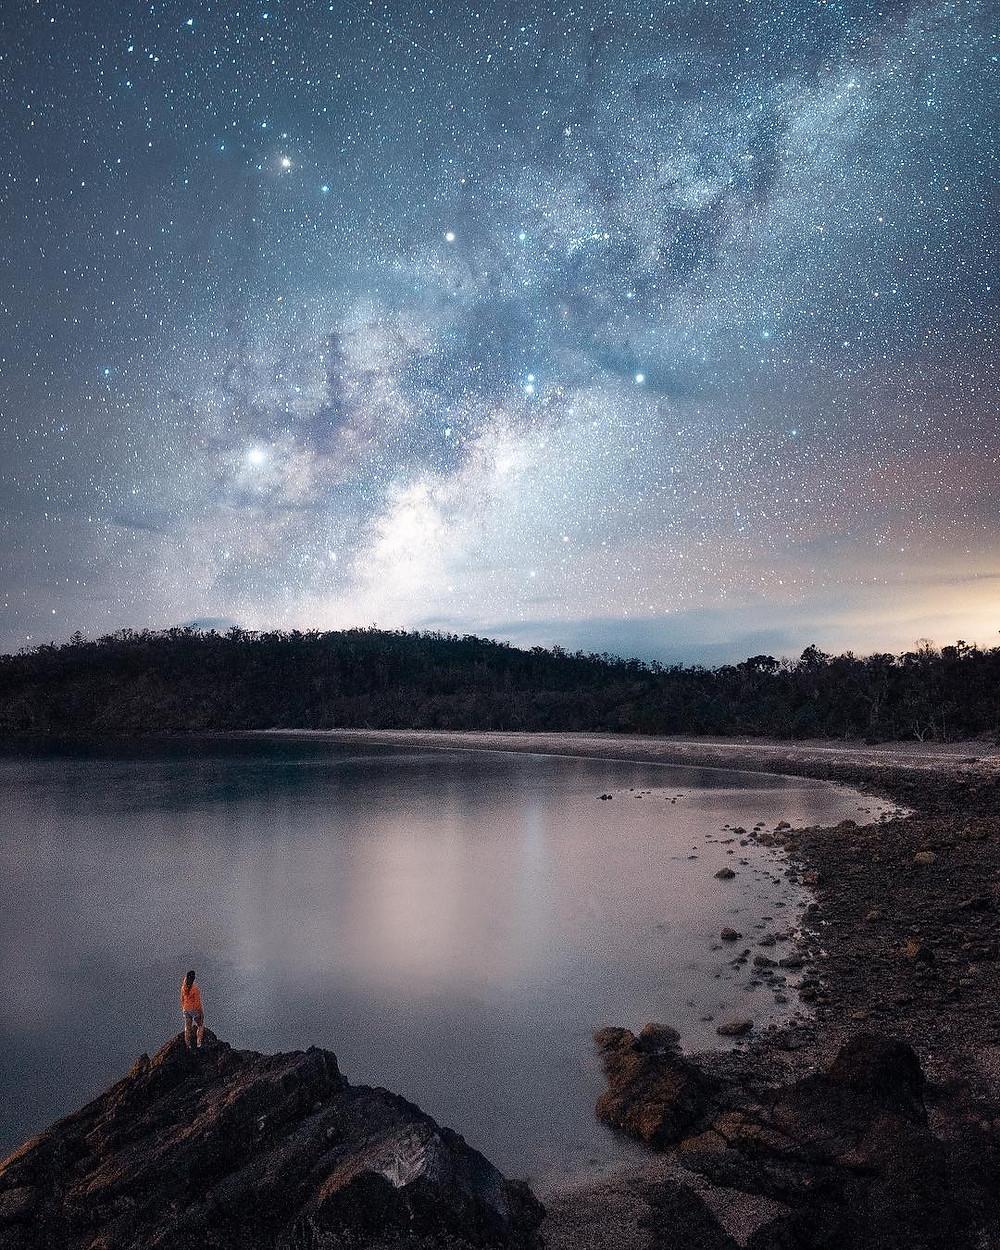 The Whitsundays by night